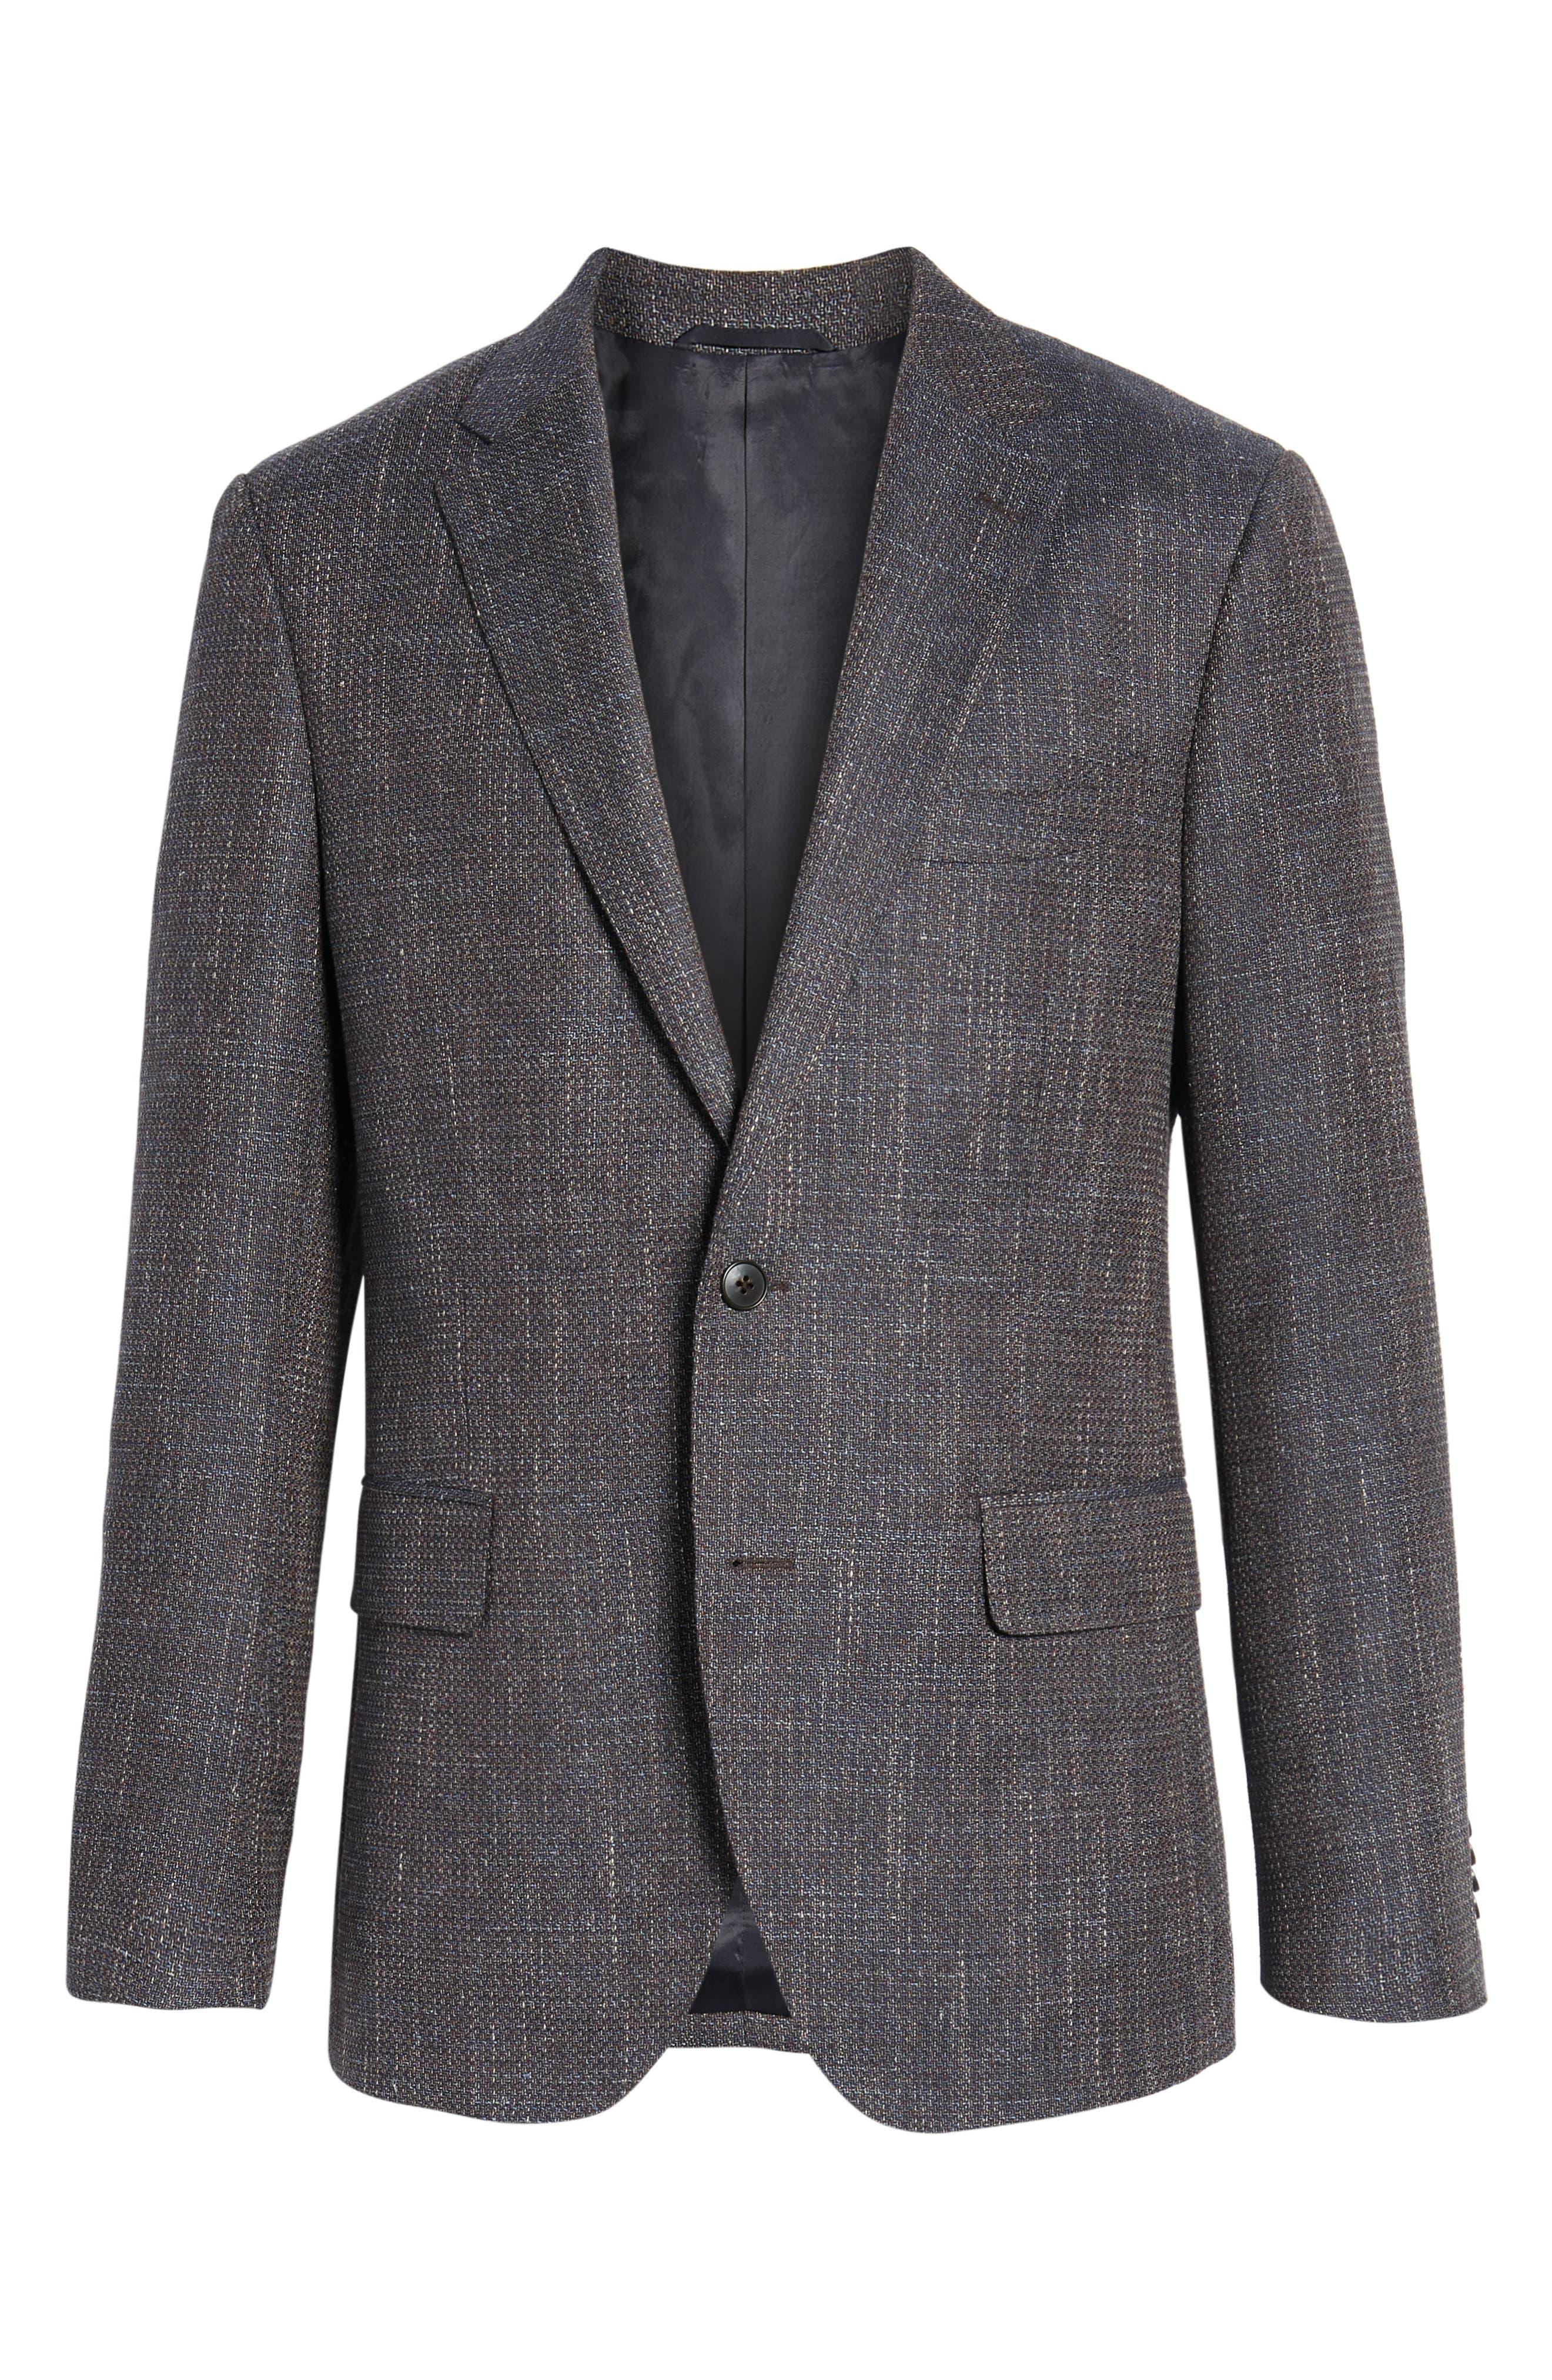 Five Bridges Slim Fit Tweed Sport Coat,                             Alternate thumbnail 6, color,                             Sepia